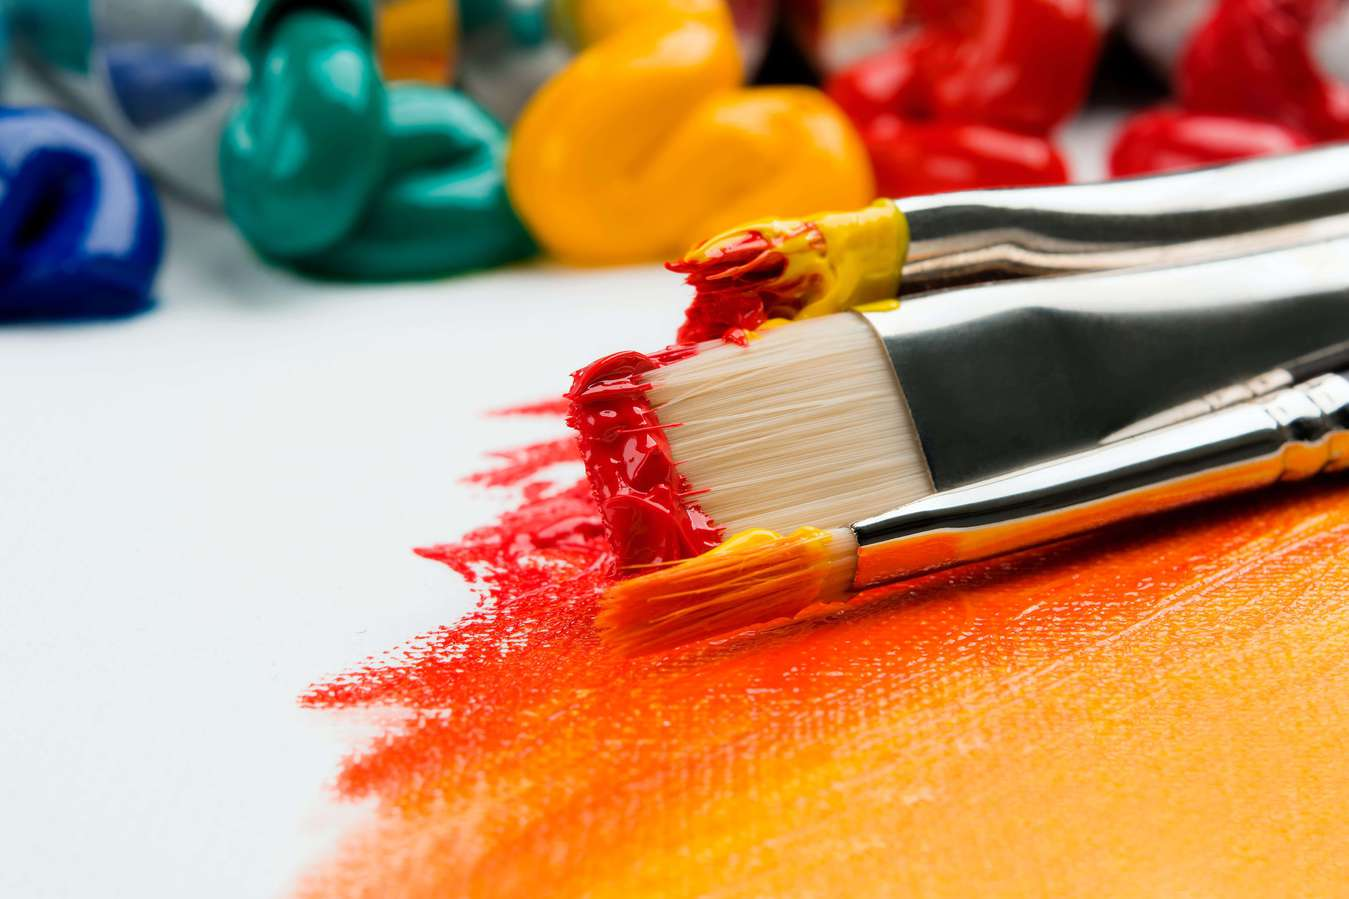 Farby i pędzle do farb